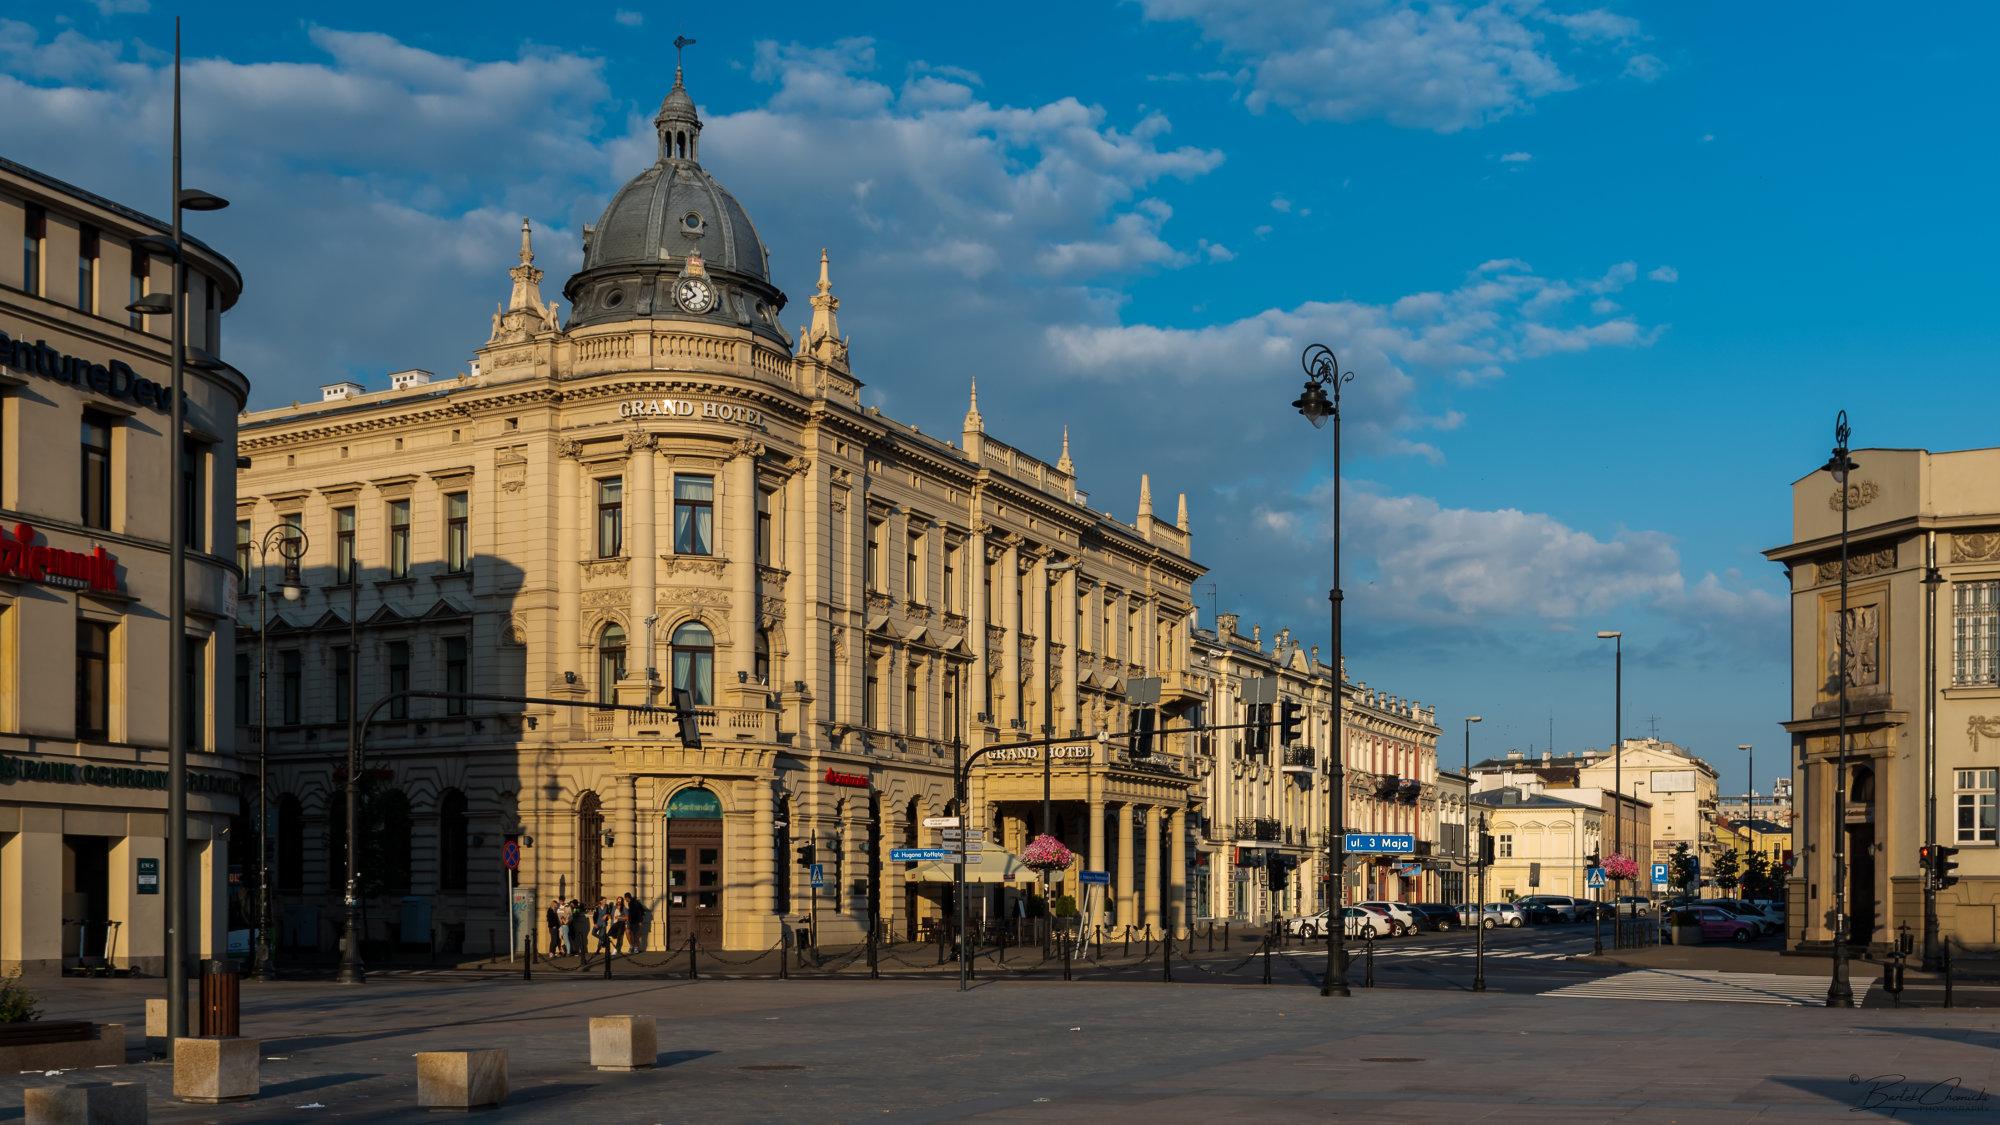 """Lublinianka"" Grand Hotel at the sunrise"